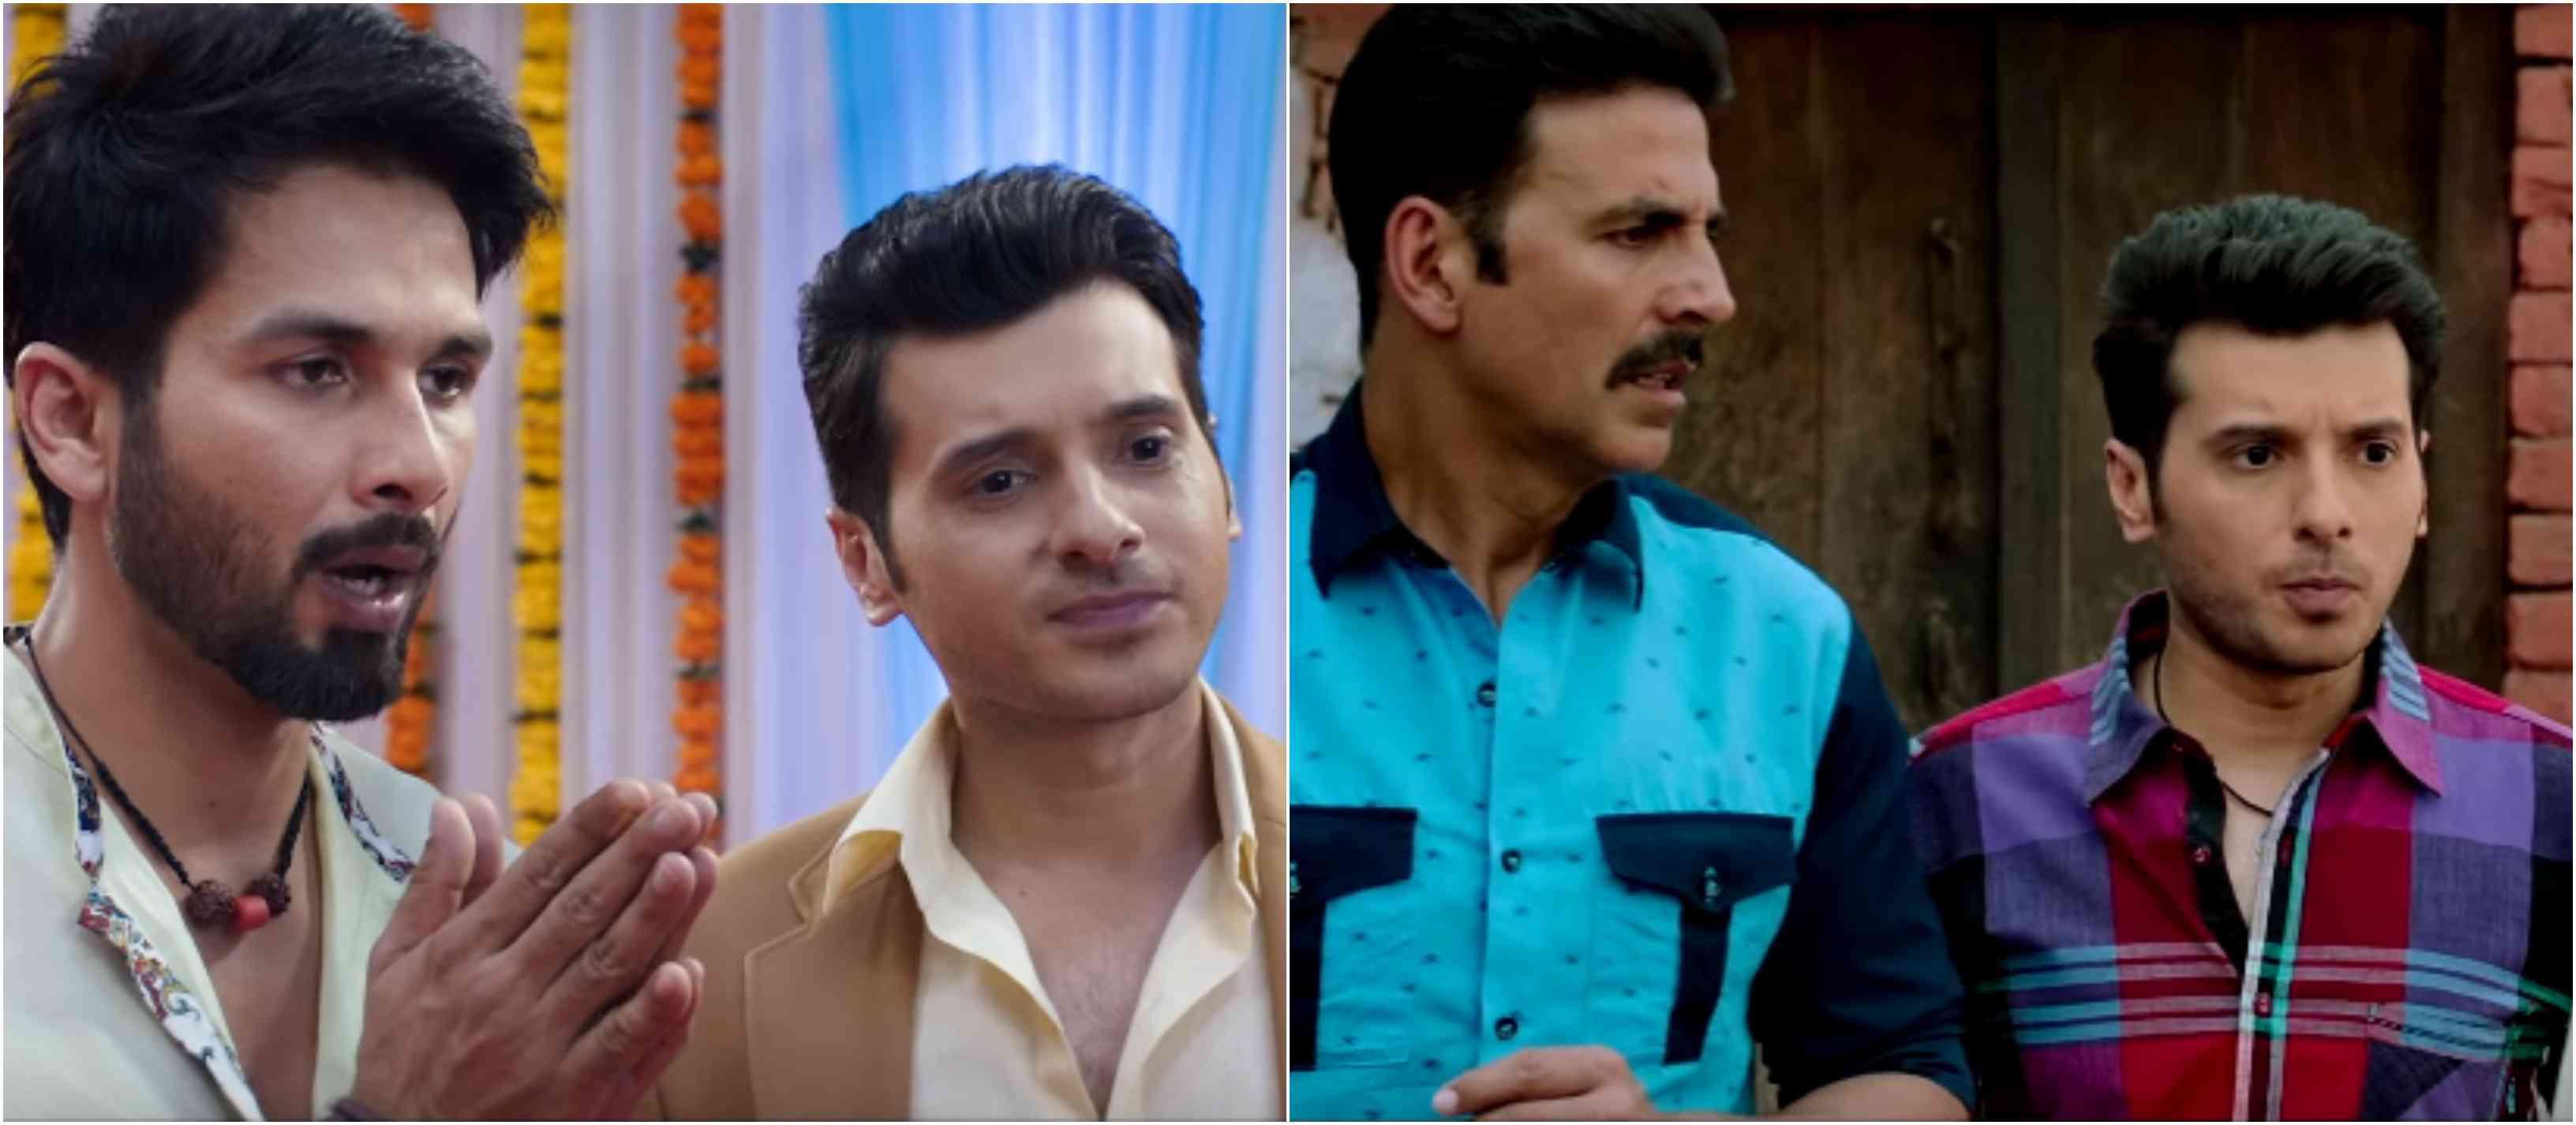 Divyendu Sharma interview: The Mirzapur actor talks about